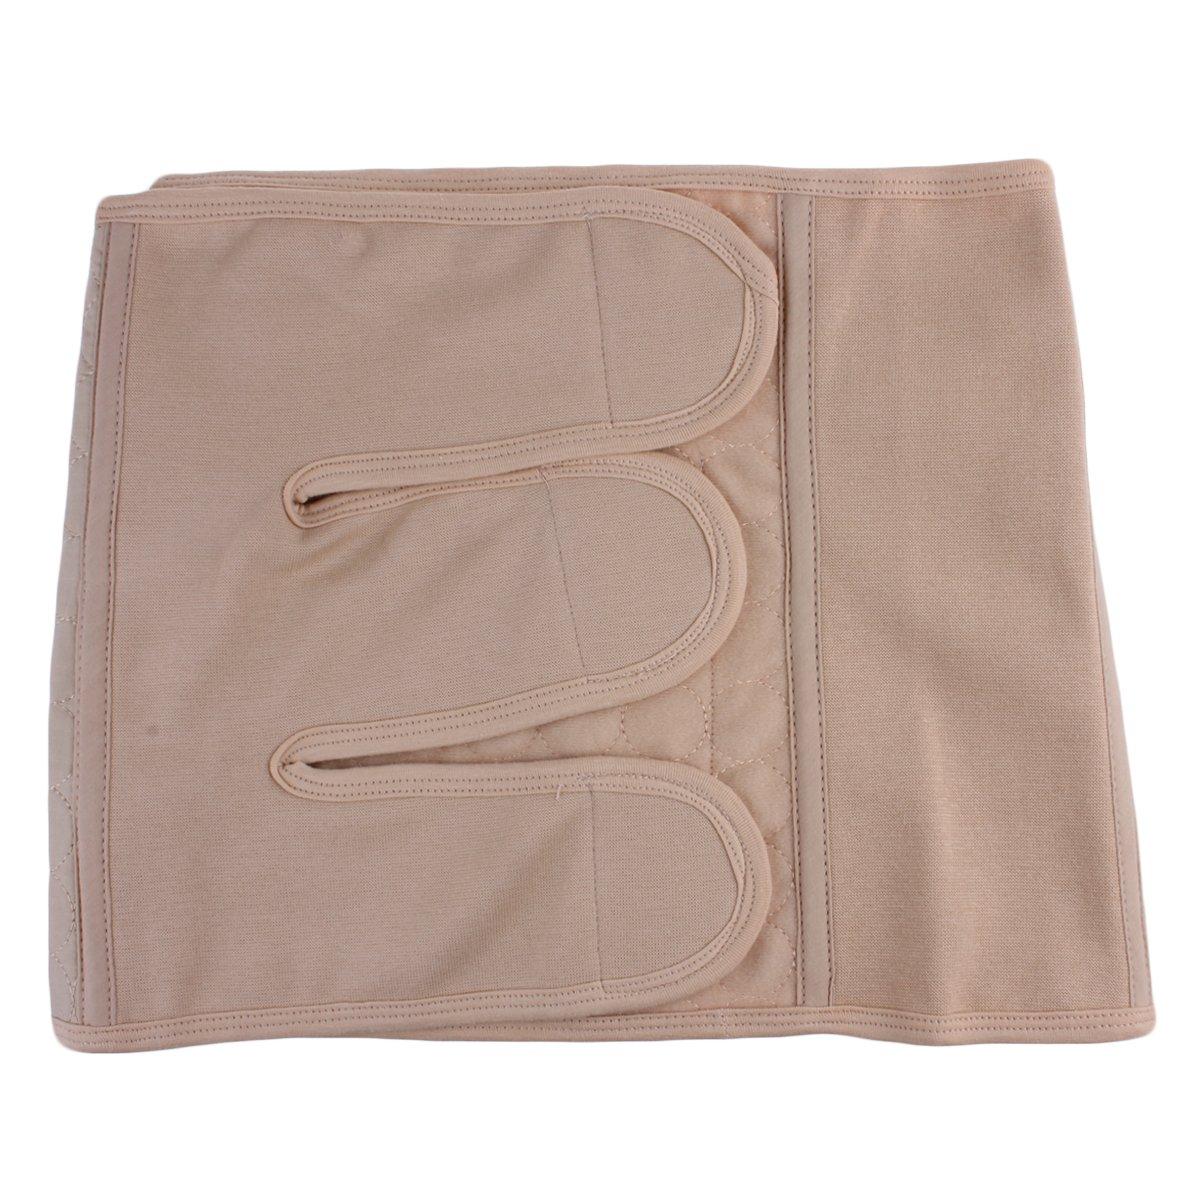 Betterme Atmungsaktive Elastic Sweat Absorption weicher Baumwolle Postpartale Erholung Gürtel, Schwangerschaft Bauch Shaper Taille Lose Fat Belly Wrap Band für Frauen günstig bestellen